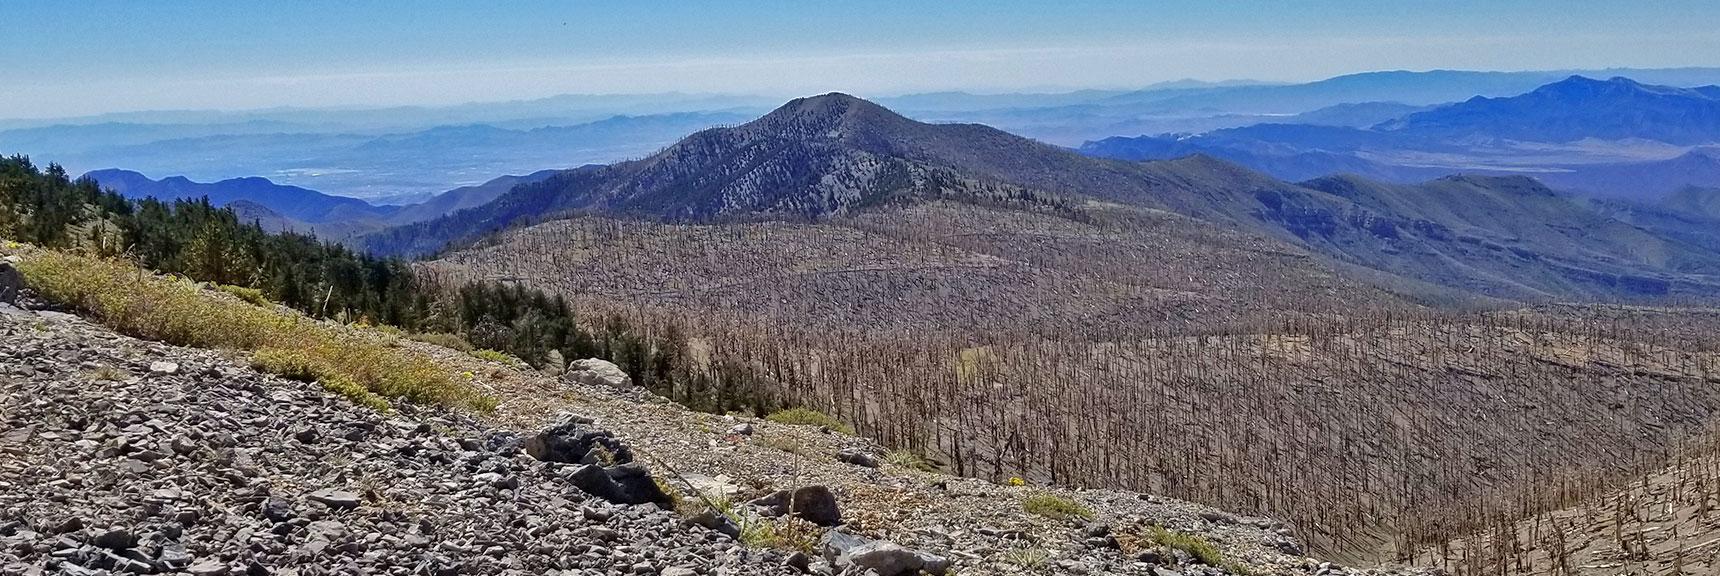 Griffith Peak and 2013 Burn Area from Upper Ridge Saddle | Griffith Peak & Charleston Peak Circuit Run, Spring Mountains, Nevada